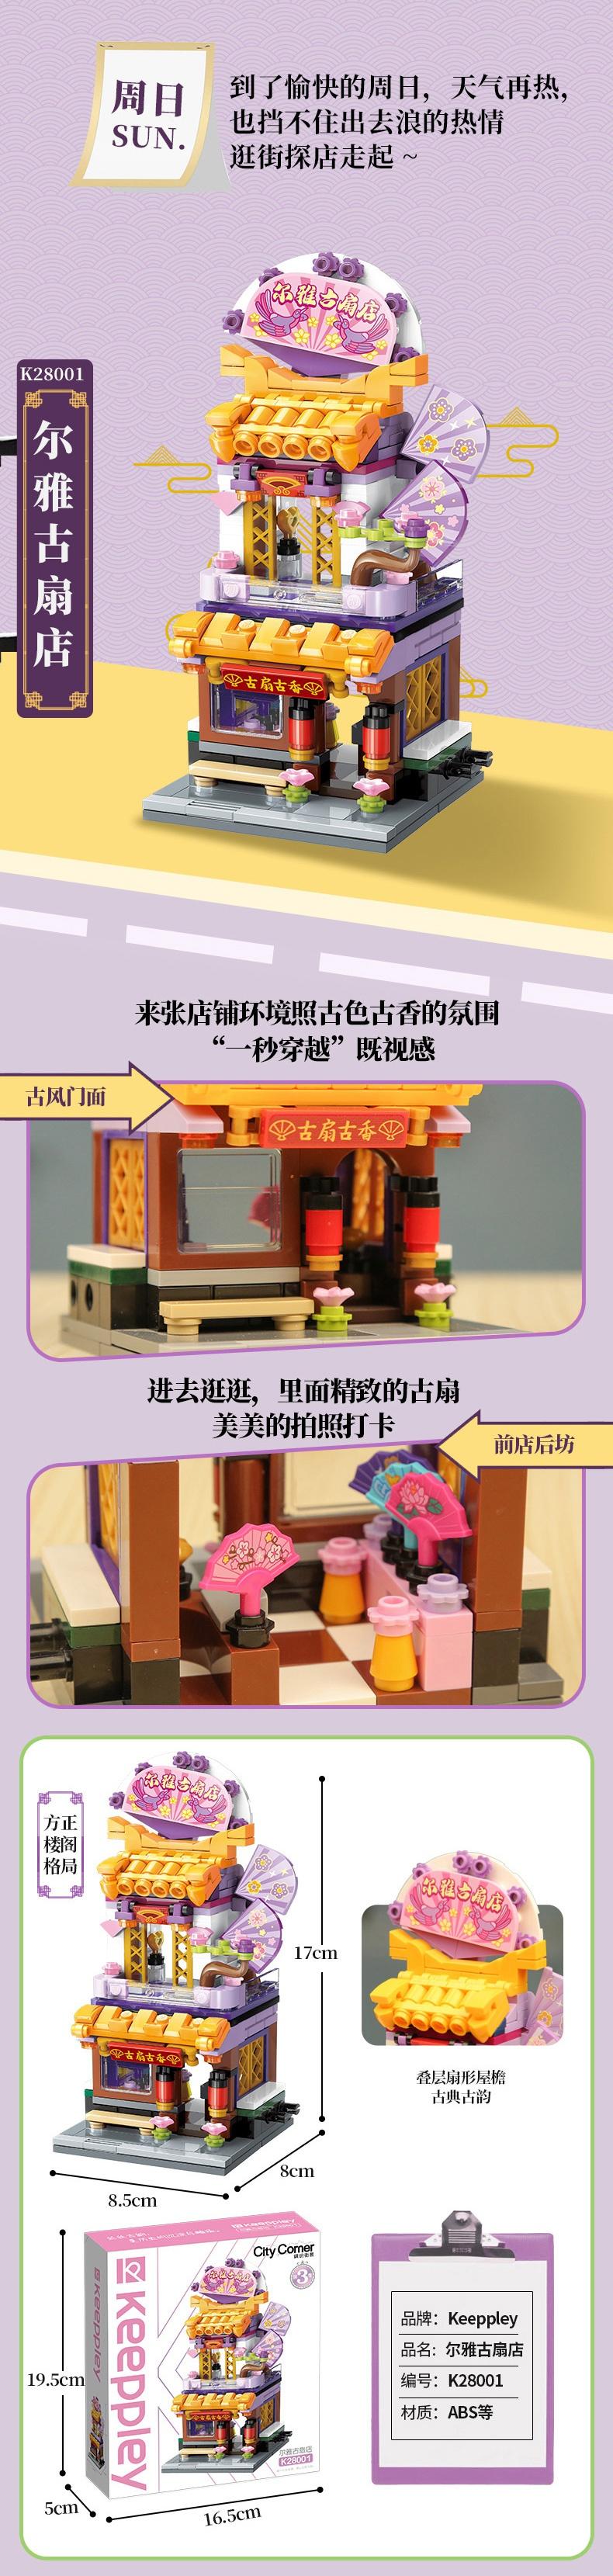 Keeppley K28001 Colorful Street Scene Series Erya Ancient Fan shop Building Blocks Toy Set